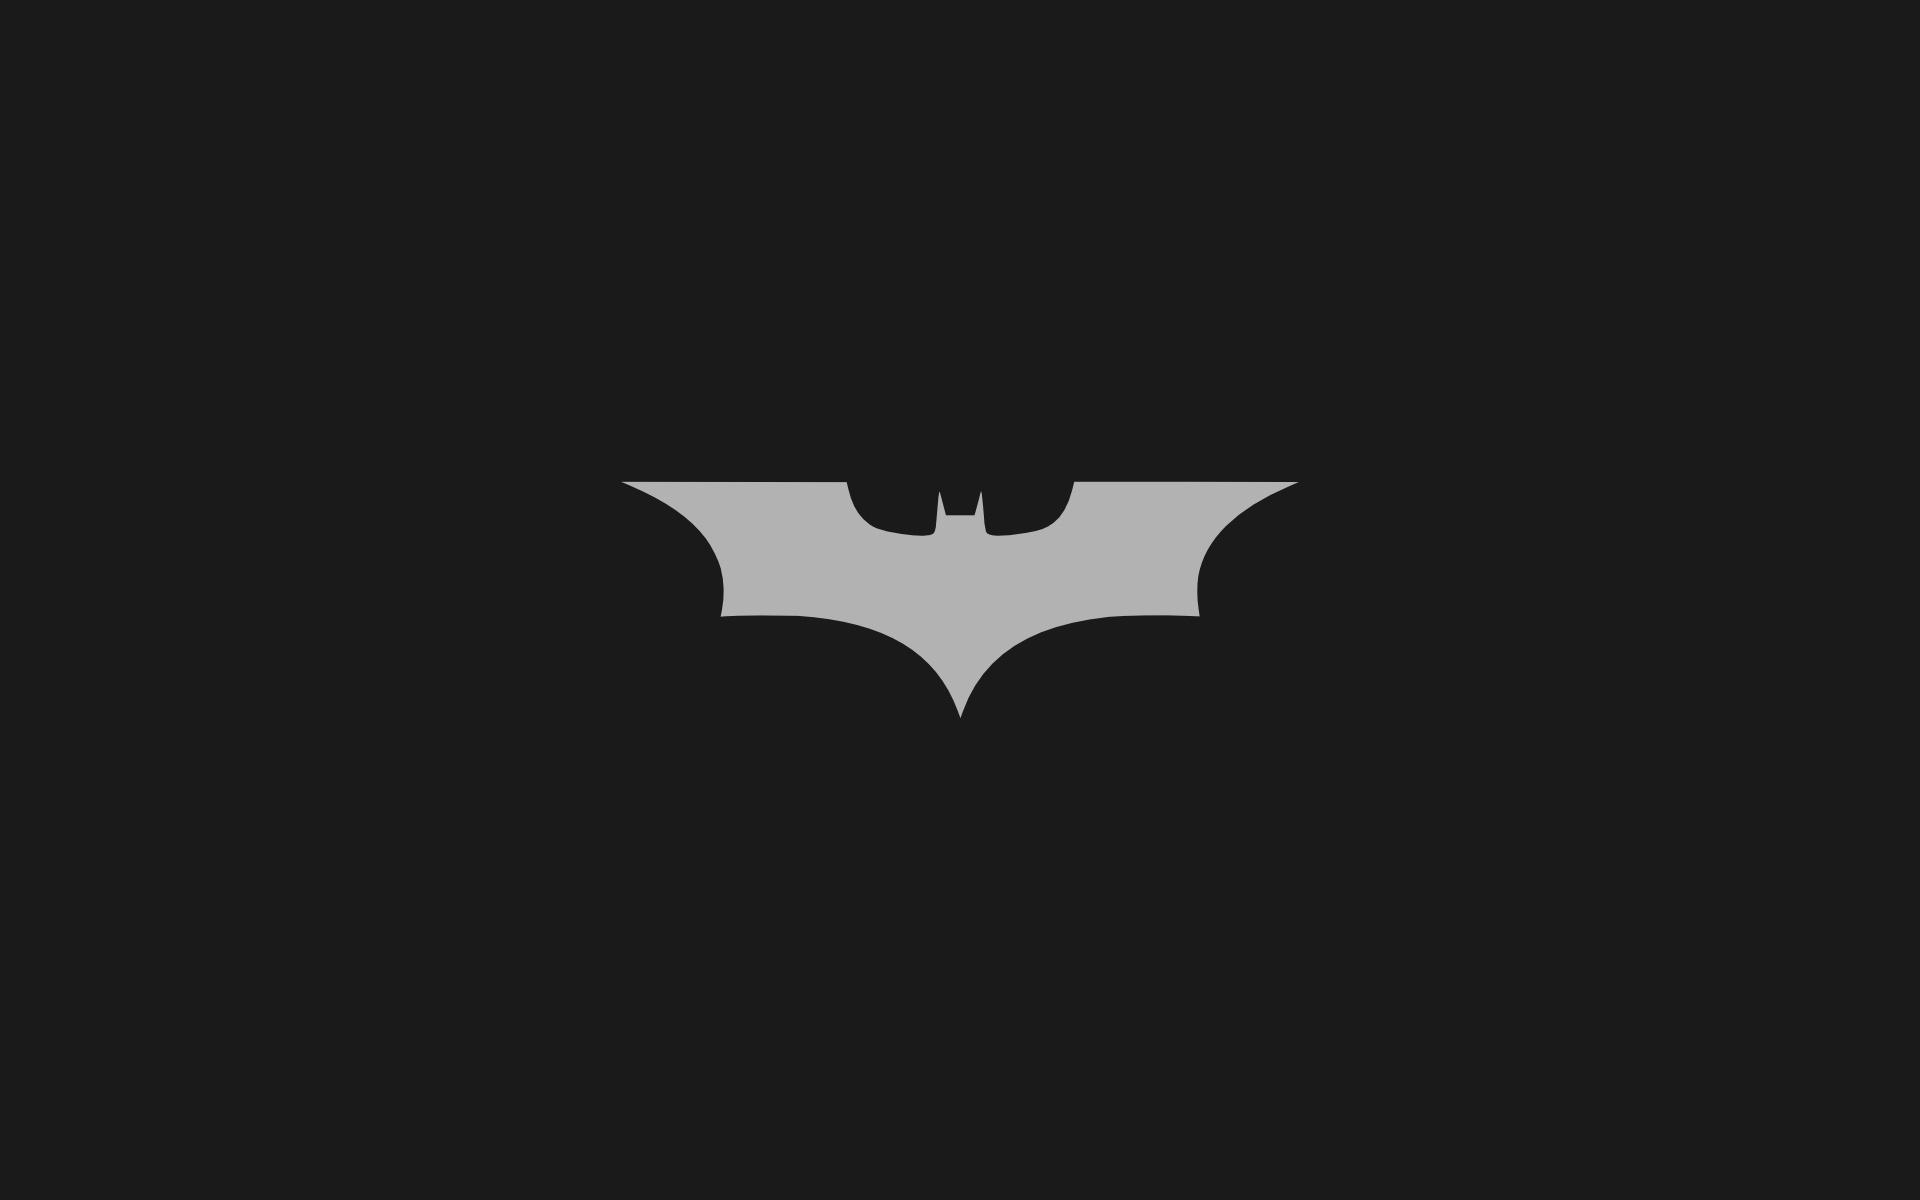 Batman Minimalism Logo